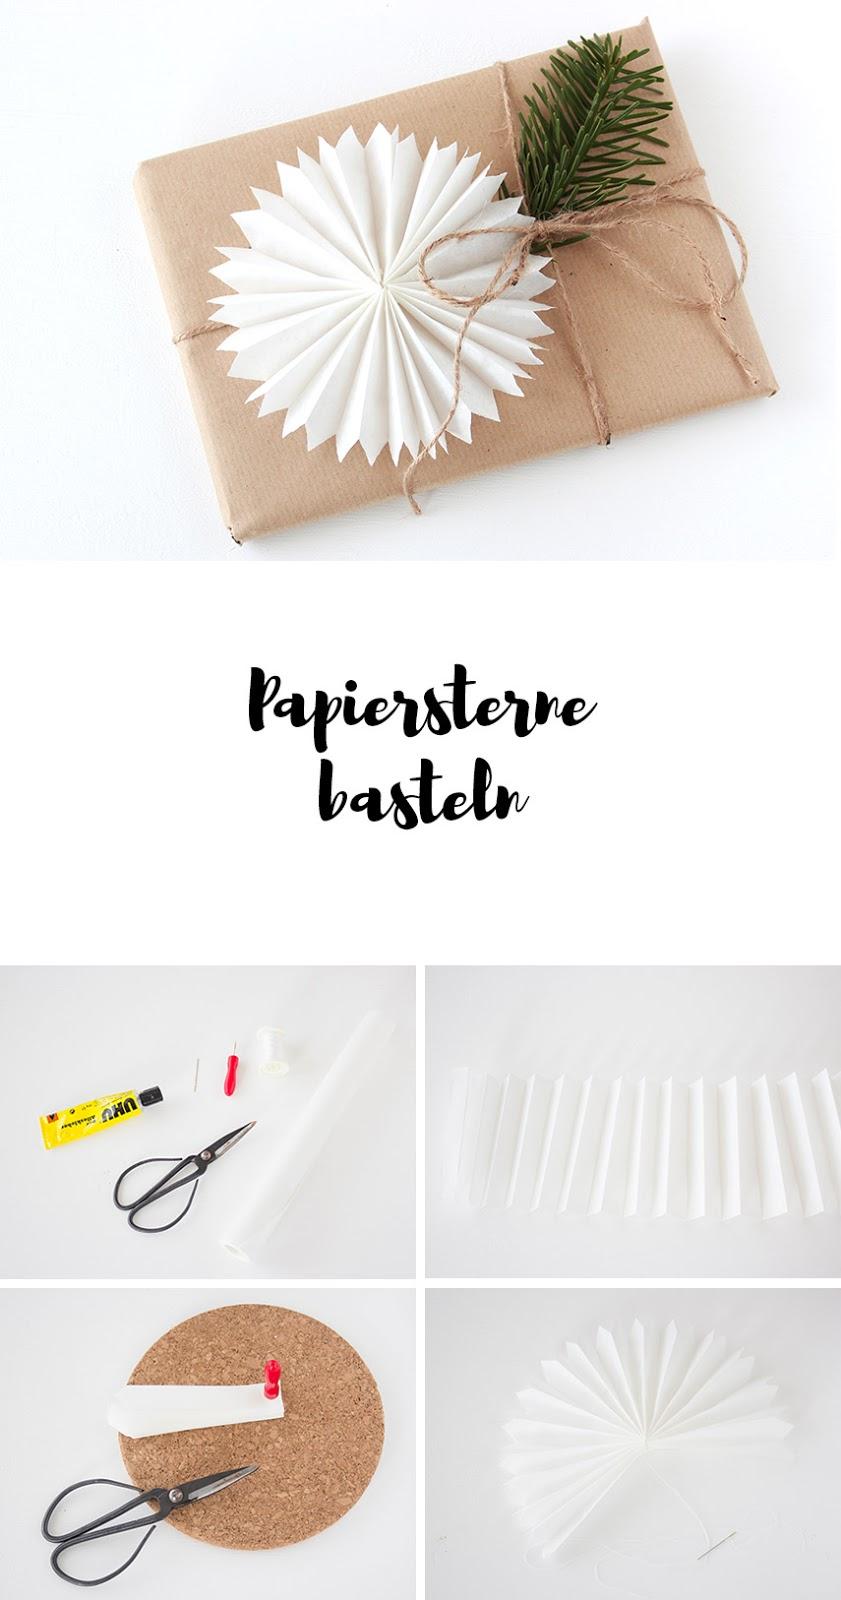 ars textura diy und foodblog 10 papiersterne die perfekte low budget dekoration. Black Bedroom Furniture Sets. Home Design Ideas